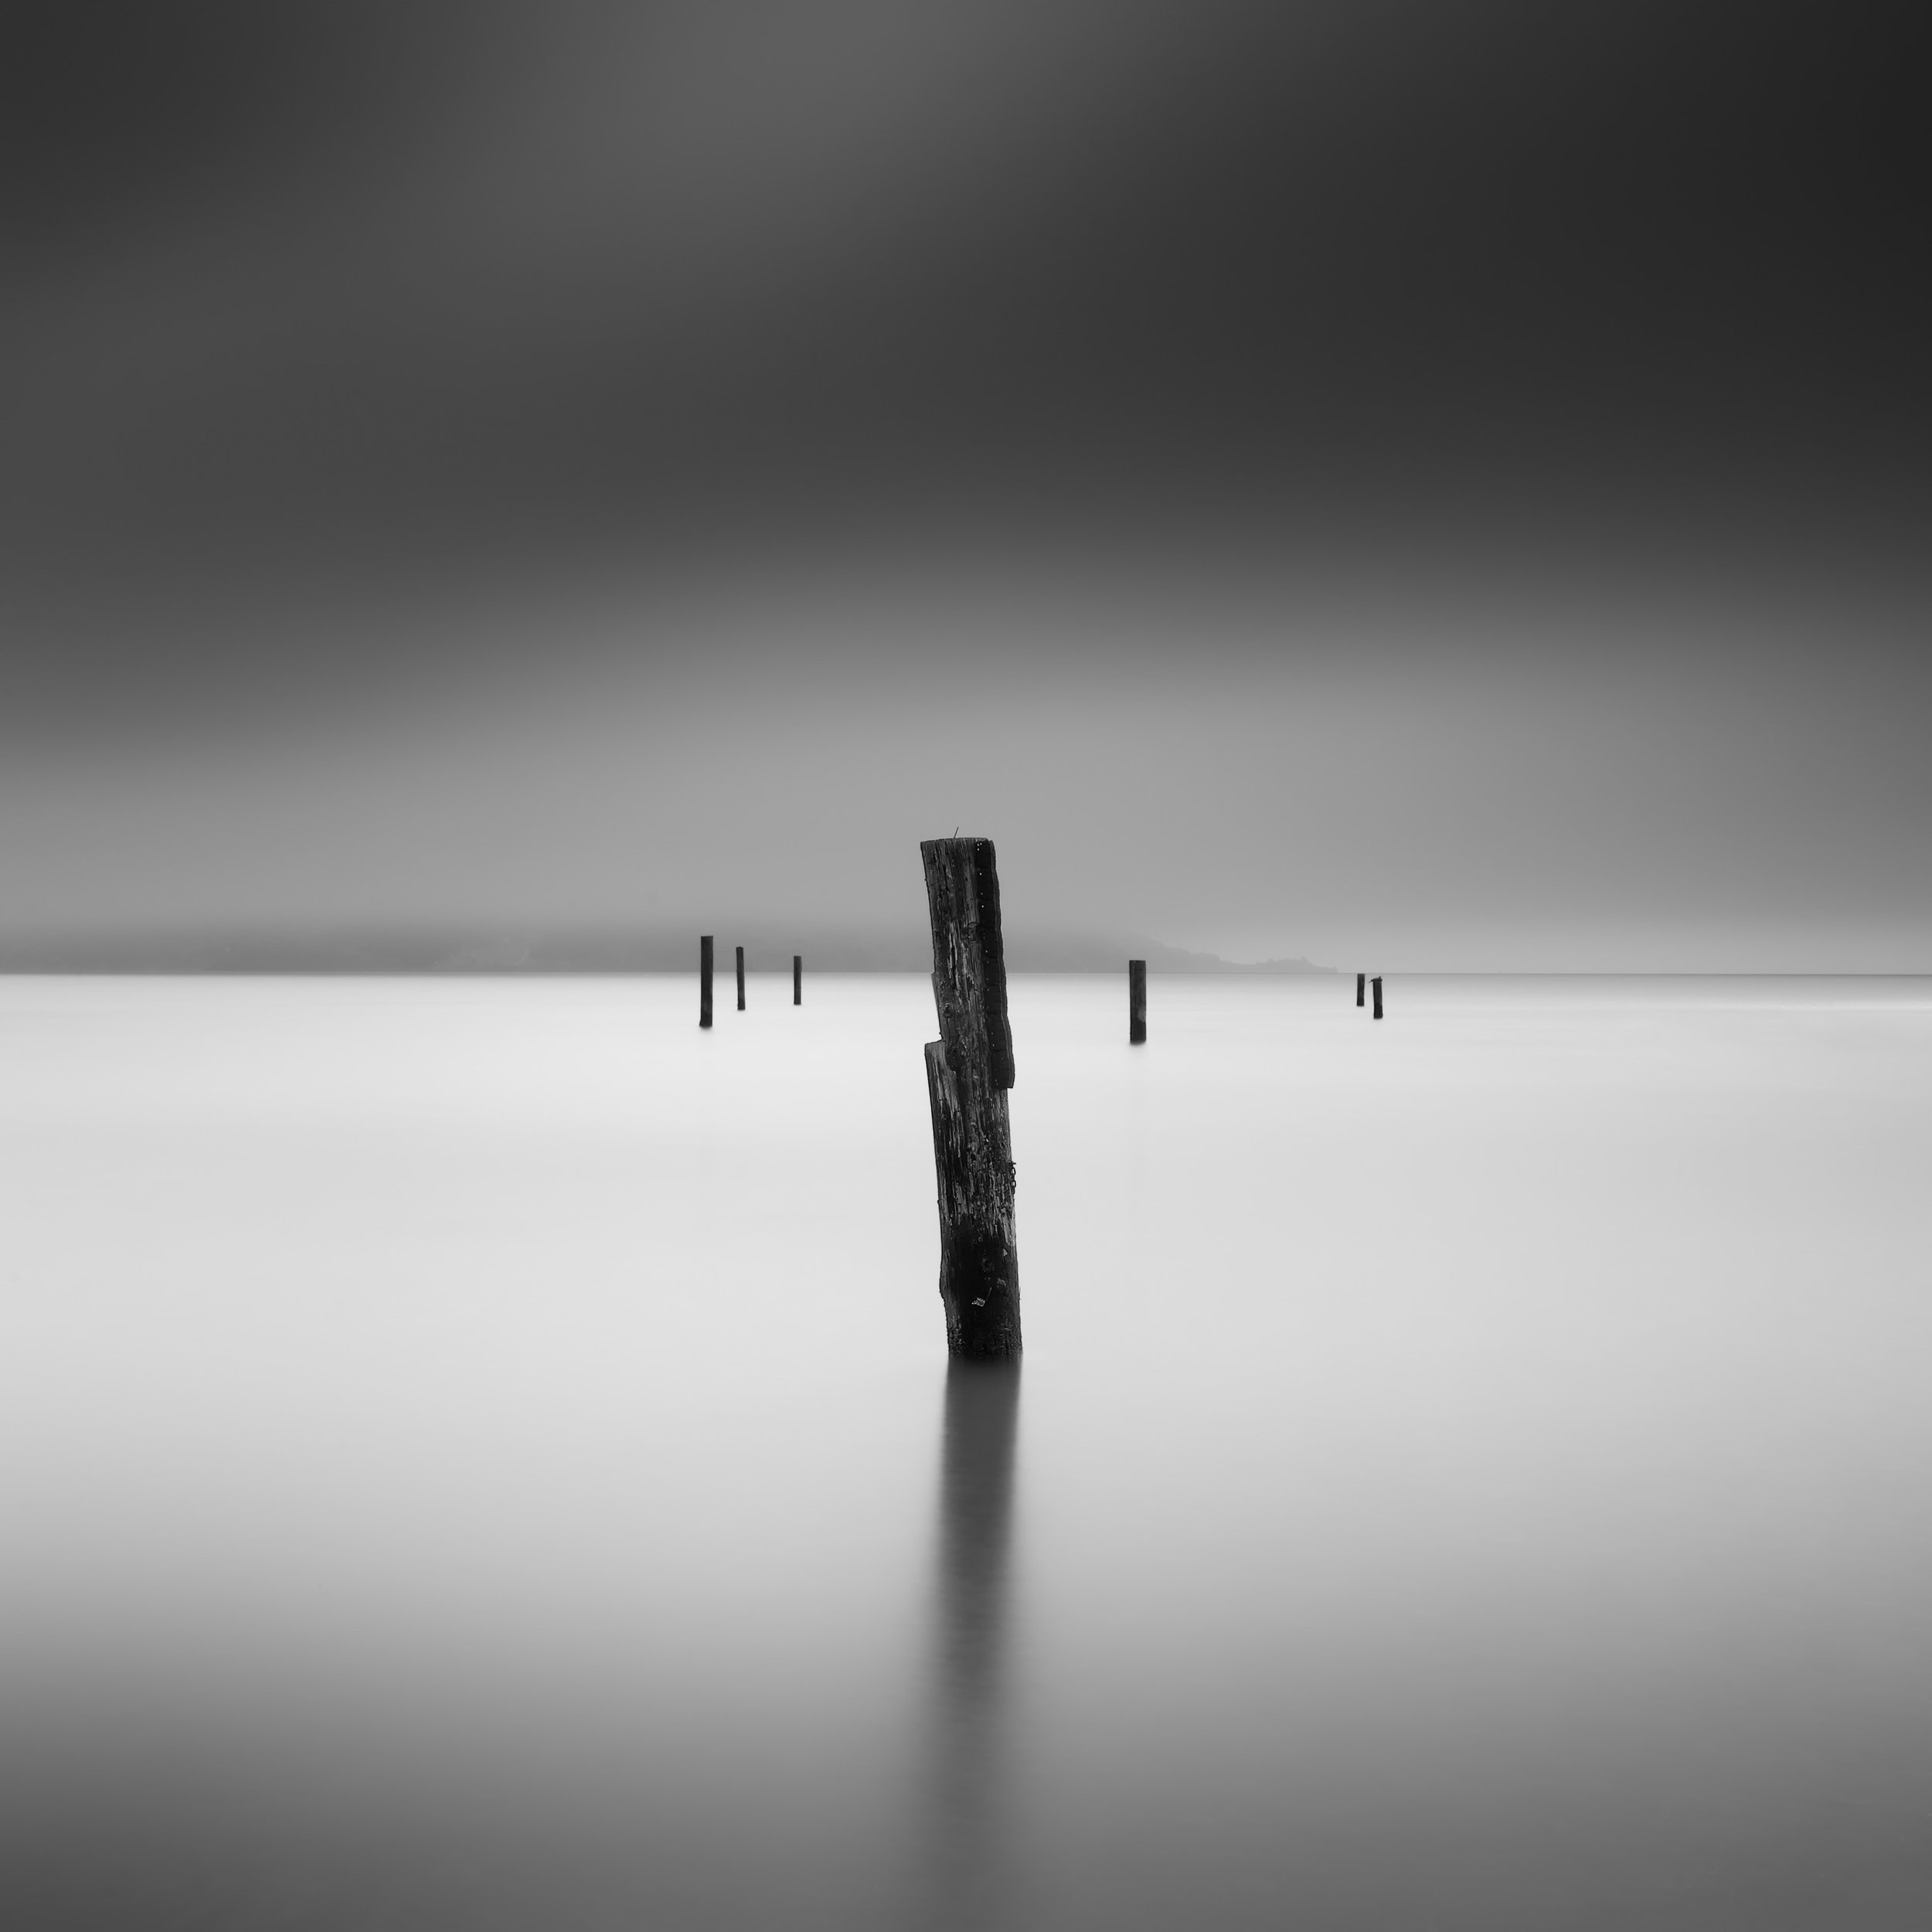 Sausalito black white pier pilings fog off balance